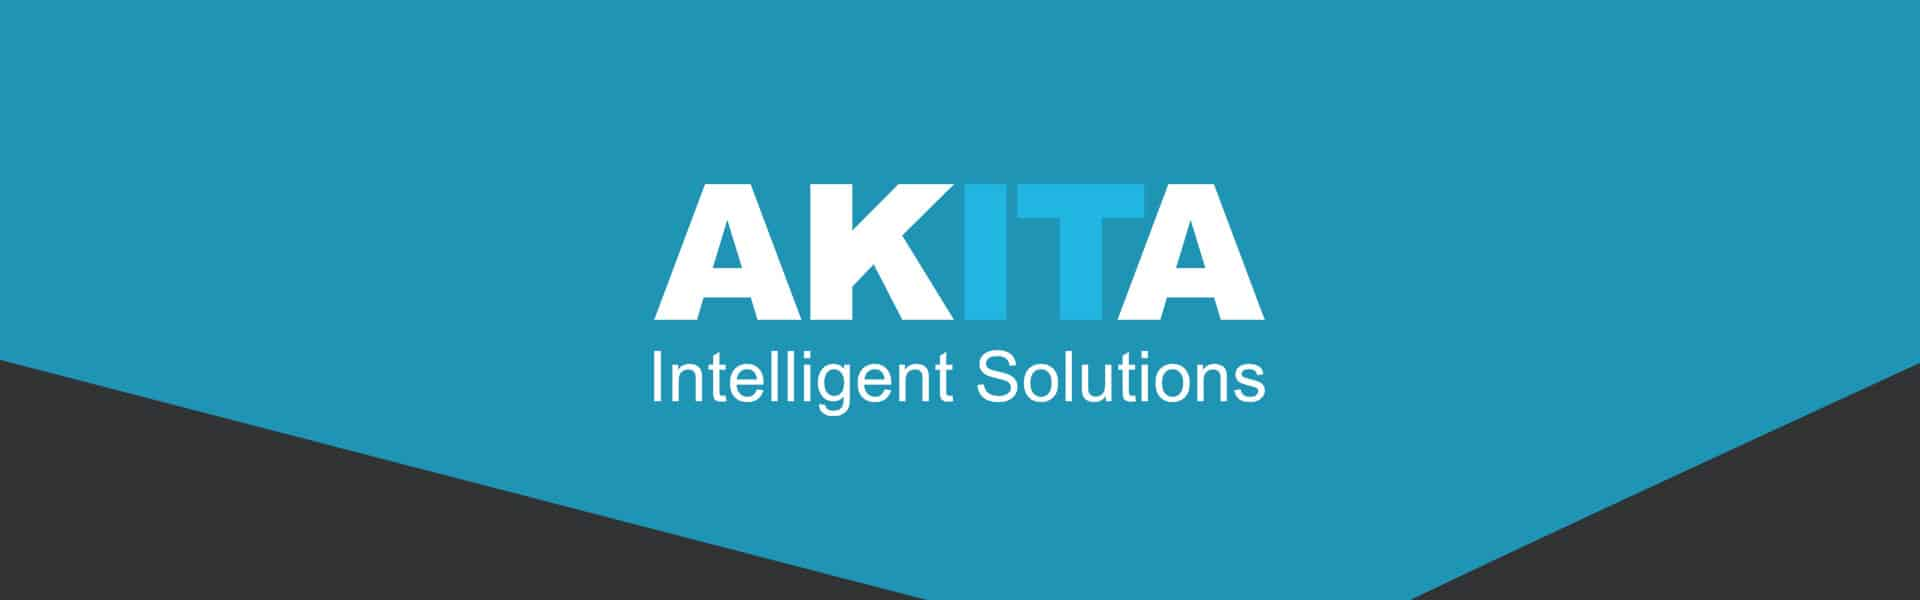 introducing akita intelligent solutions